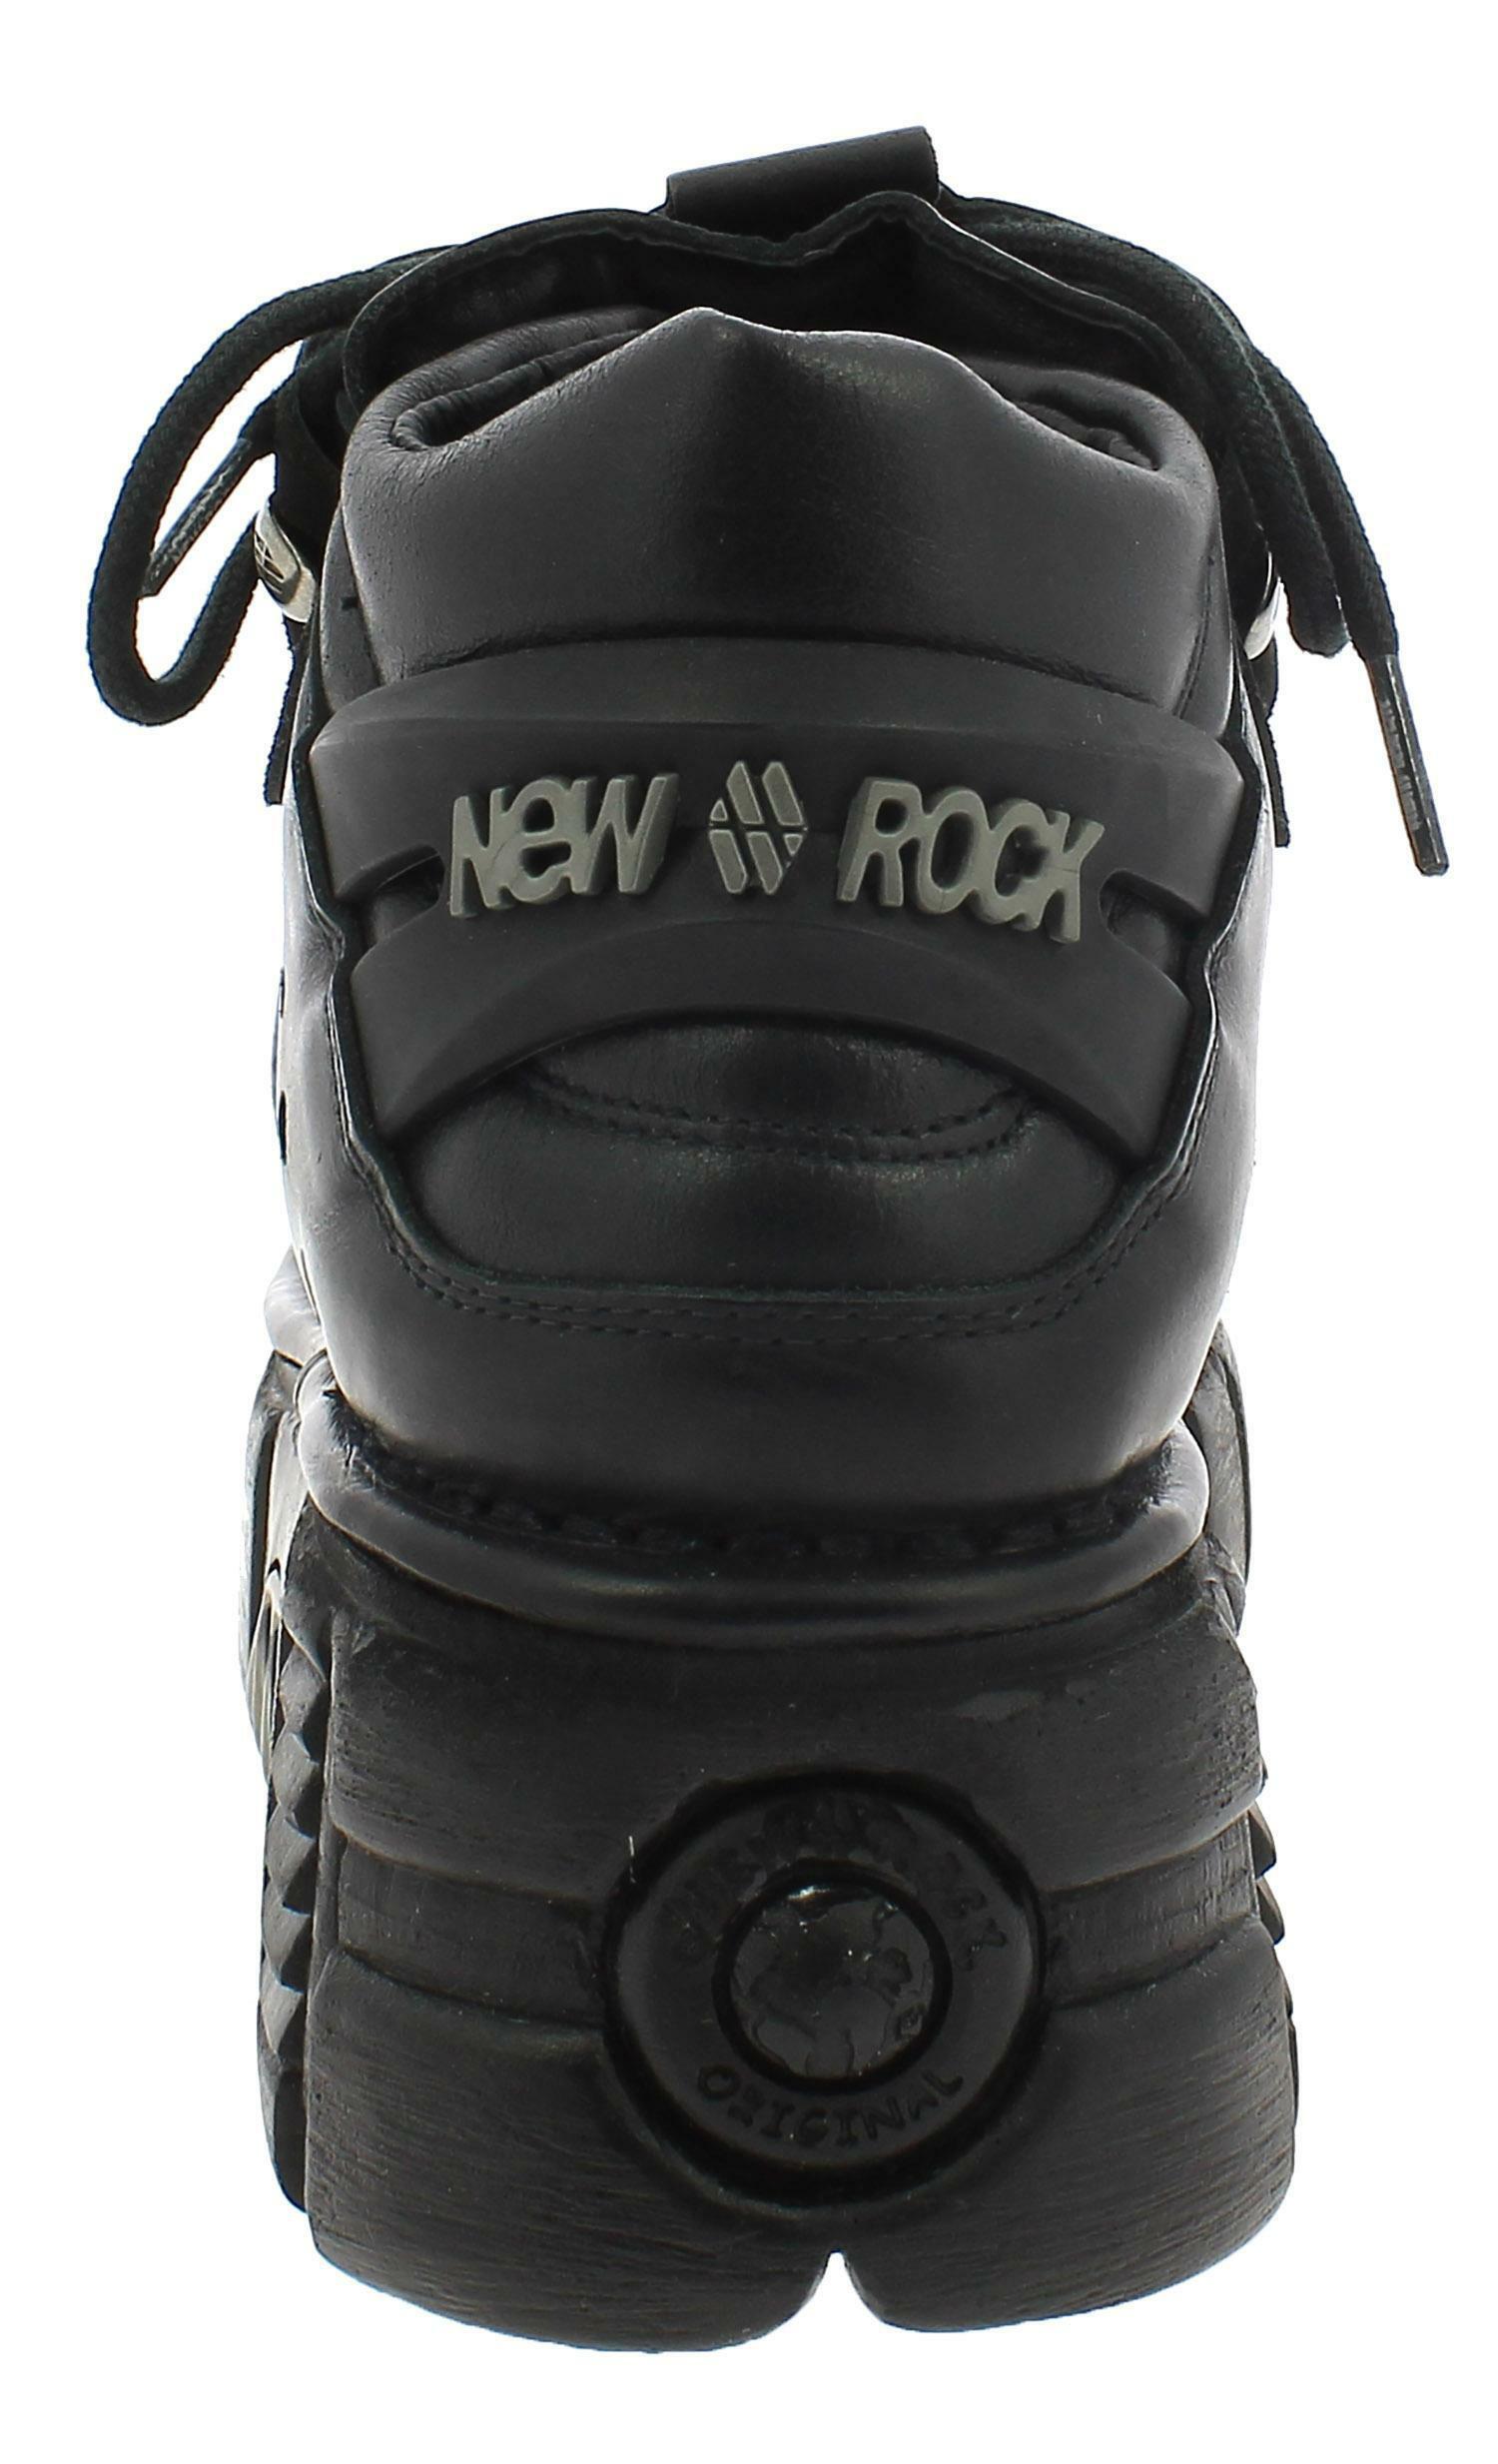 wholesale dealer 1a9e7 34b5f New rock continental scarpe donna nere m106c66